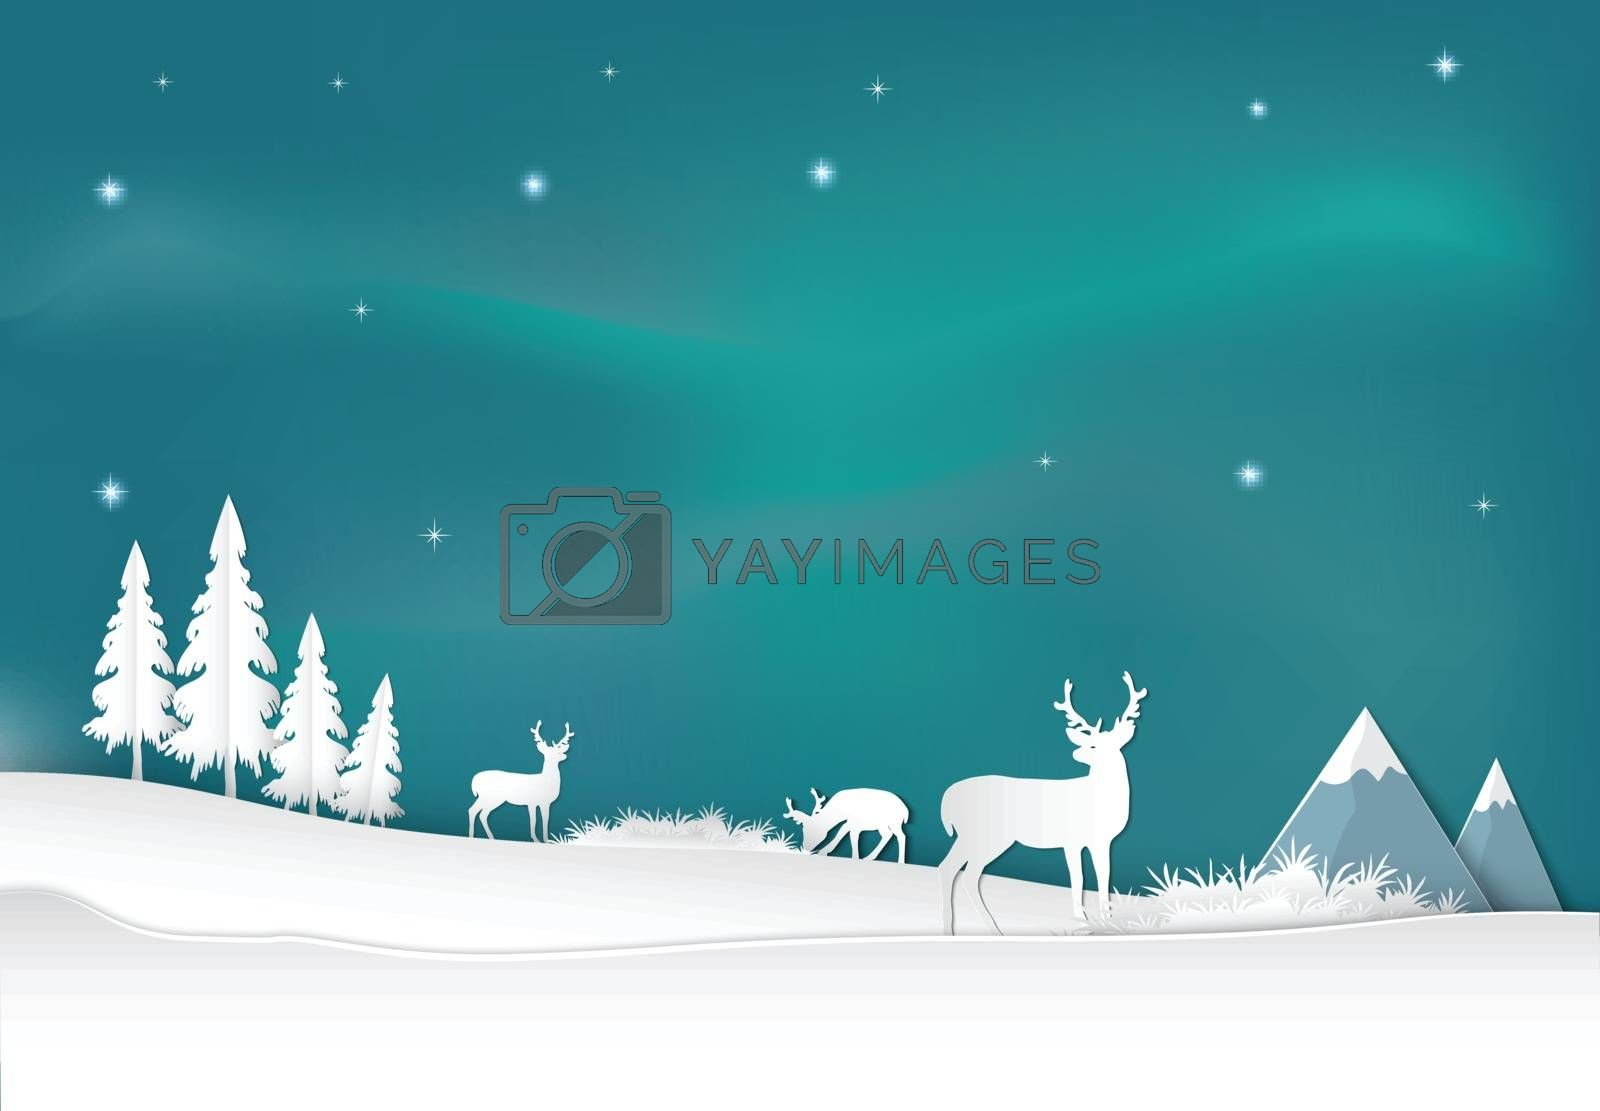 Deer with aurora background. Christmas season paper art style illustration.